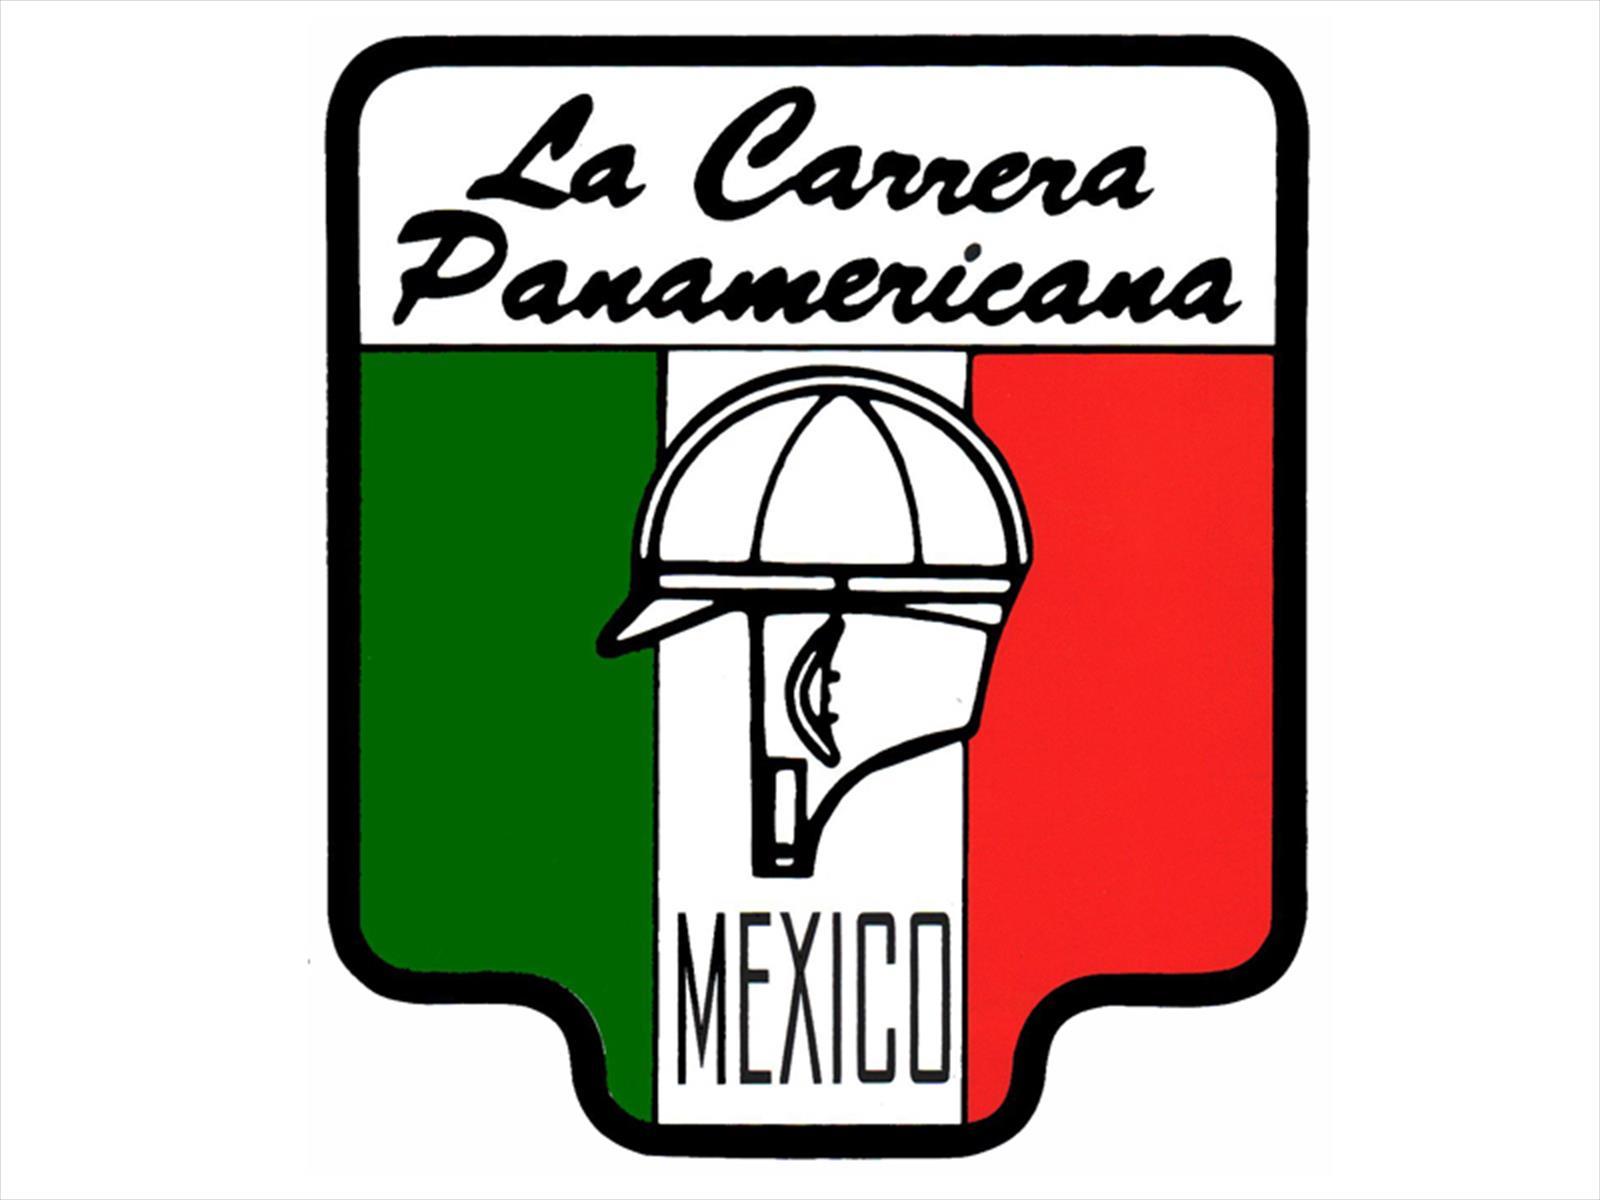 La Carrera Panamericana M 233 Xico Autocosmos Com